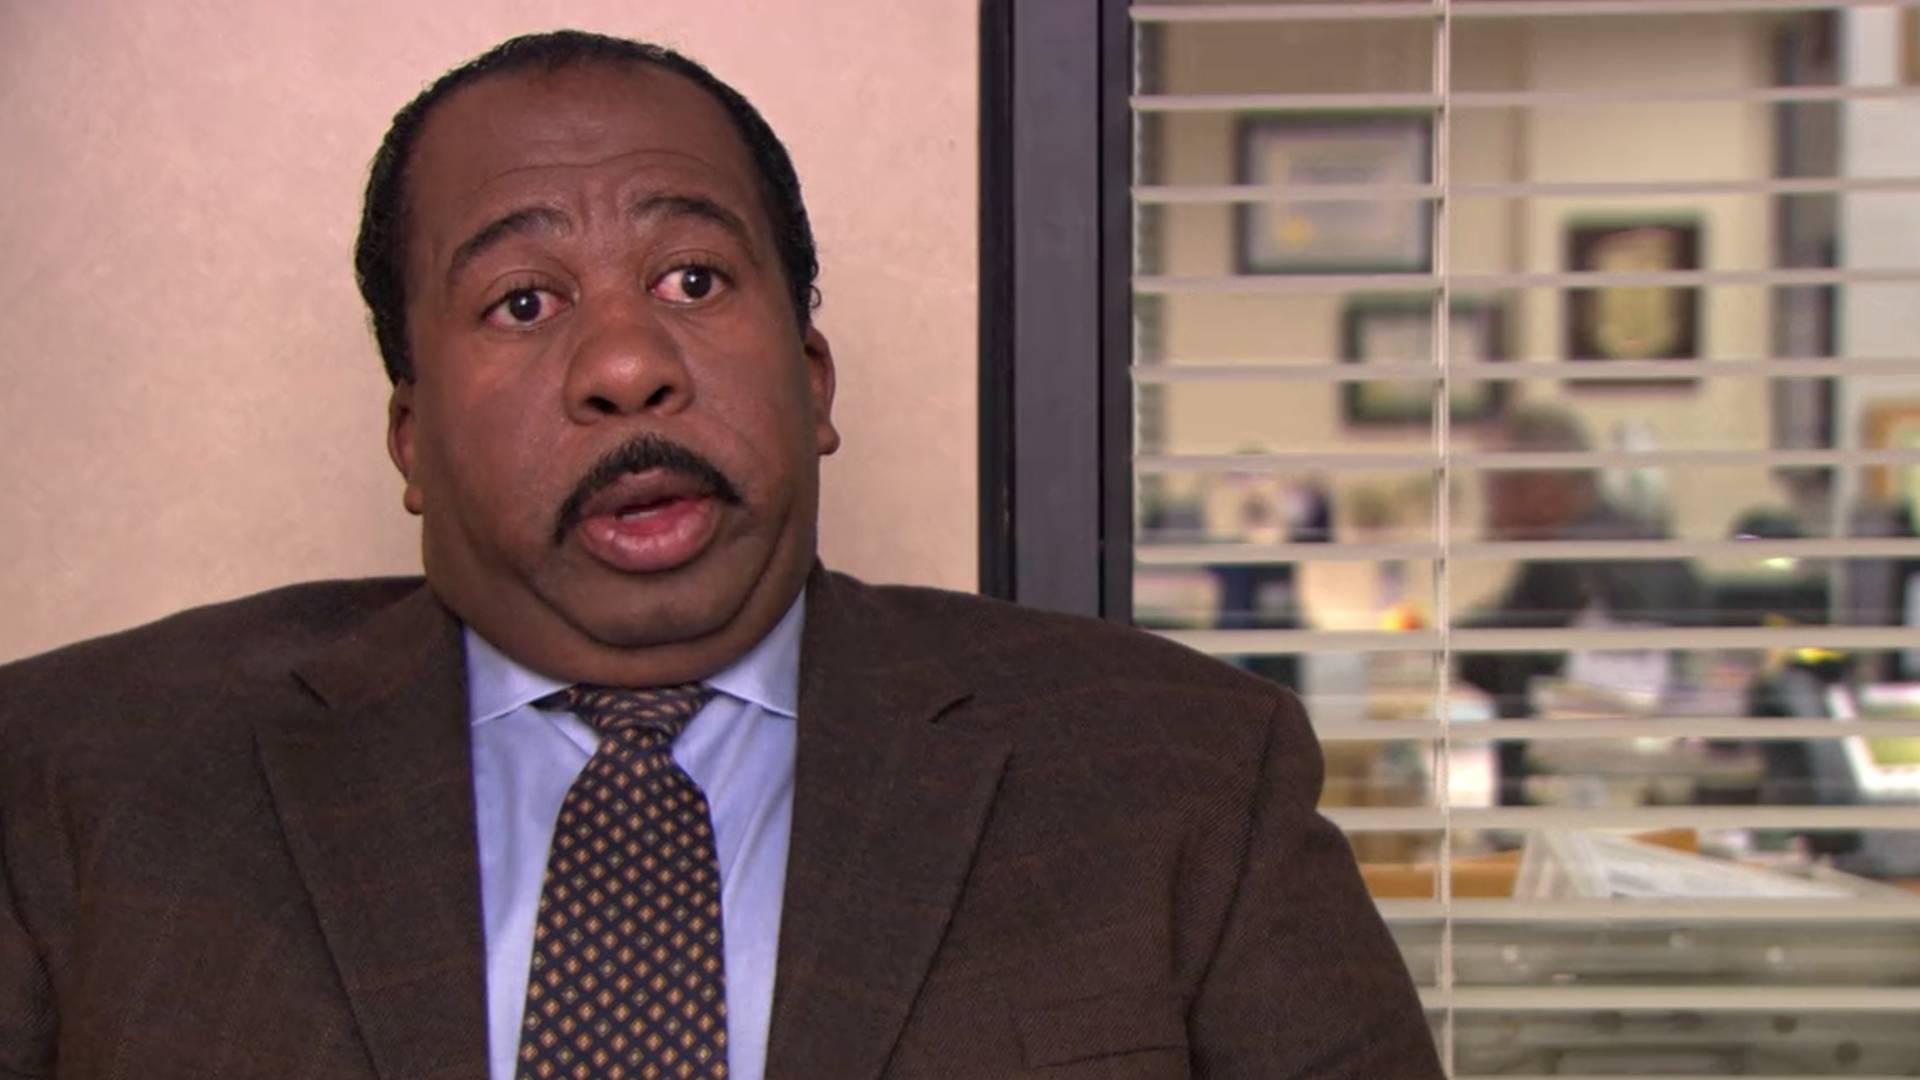 The Office Season 5 Episode 14